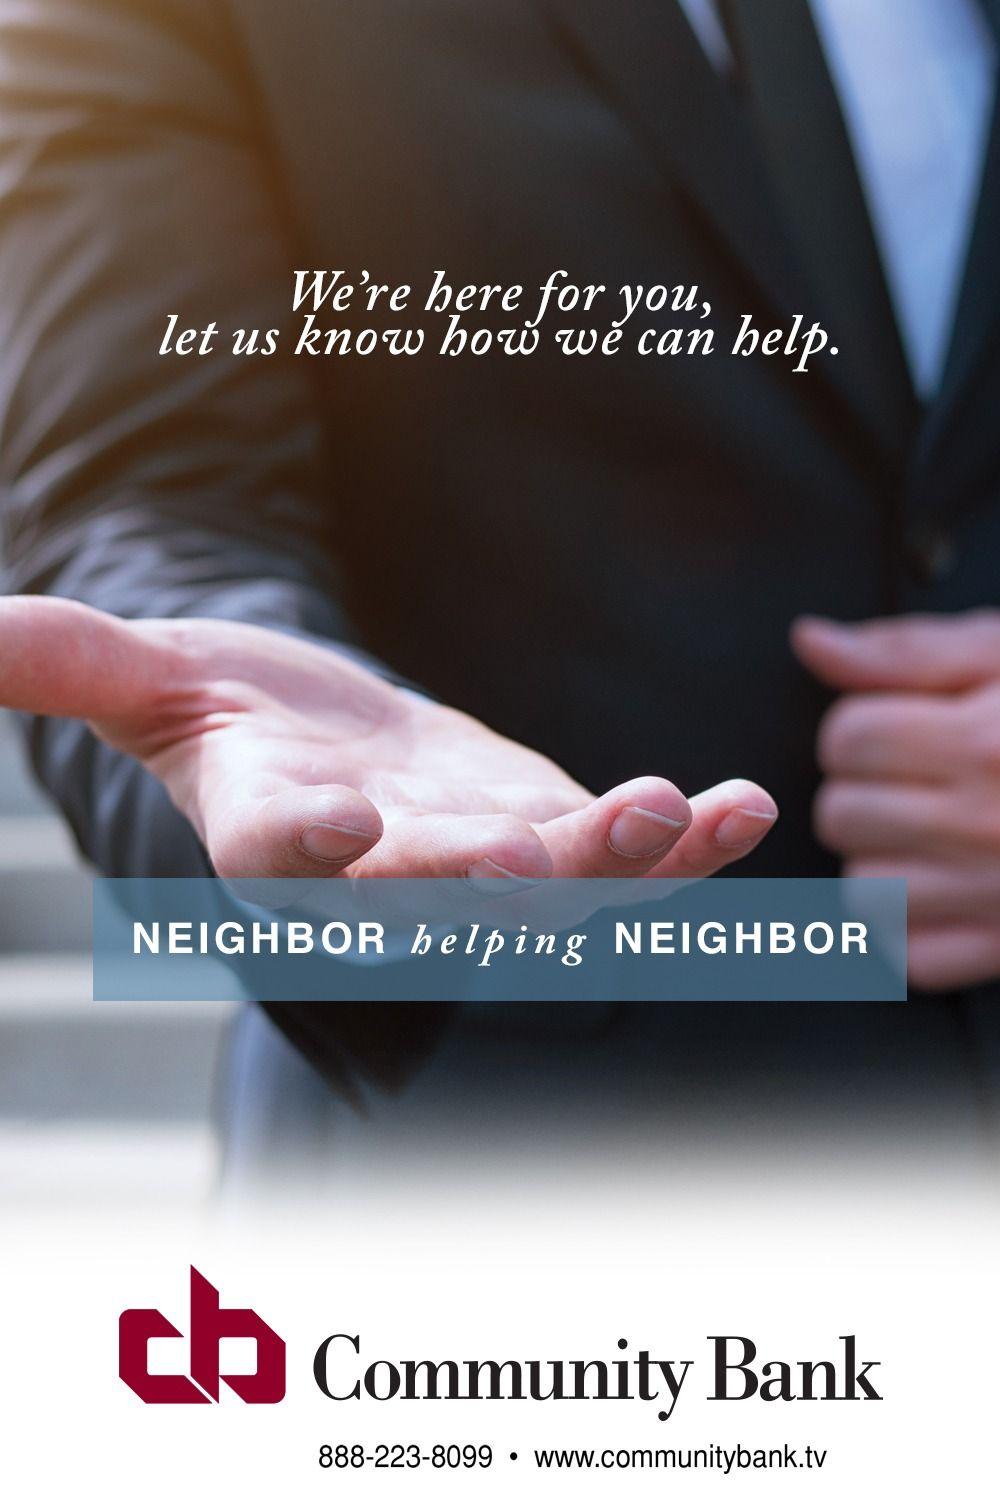 Community BankNeighbor Helping Neighbor in 2020